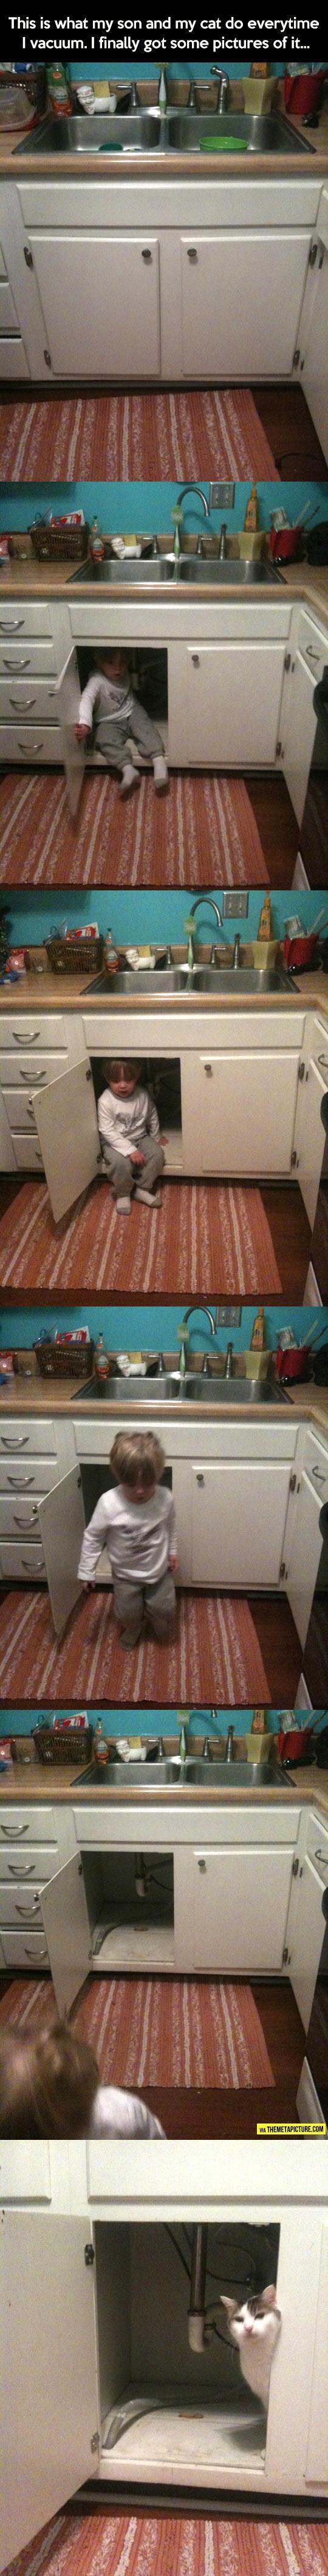 Scared Of The Vacuum